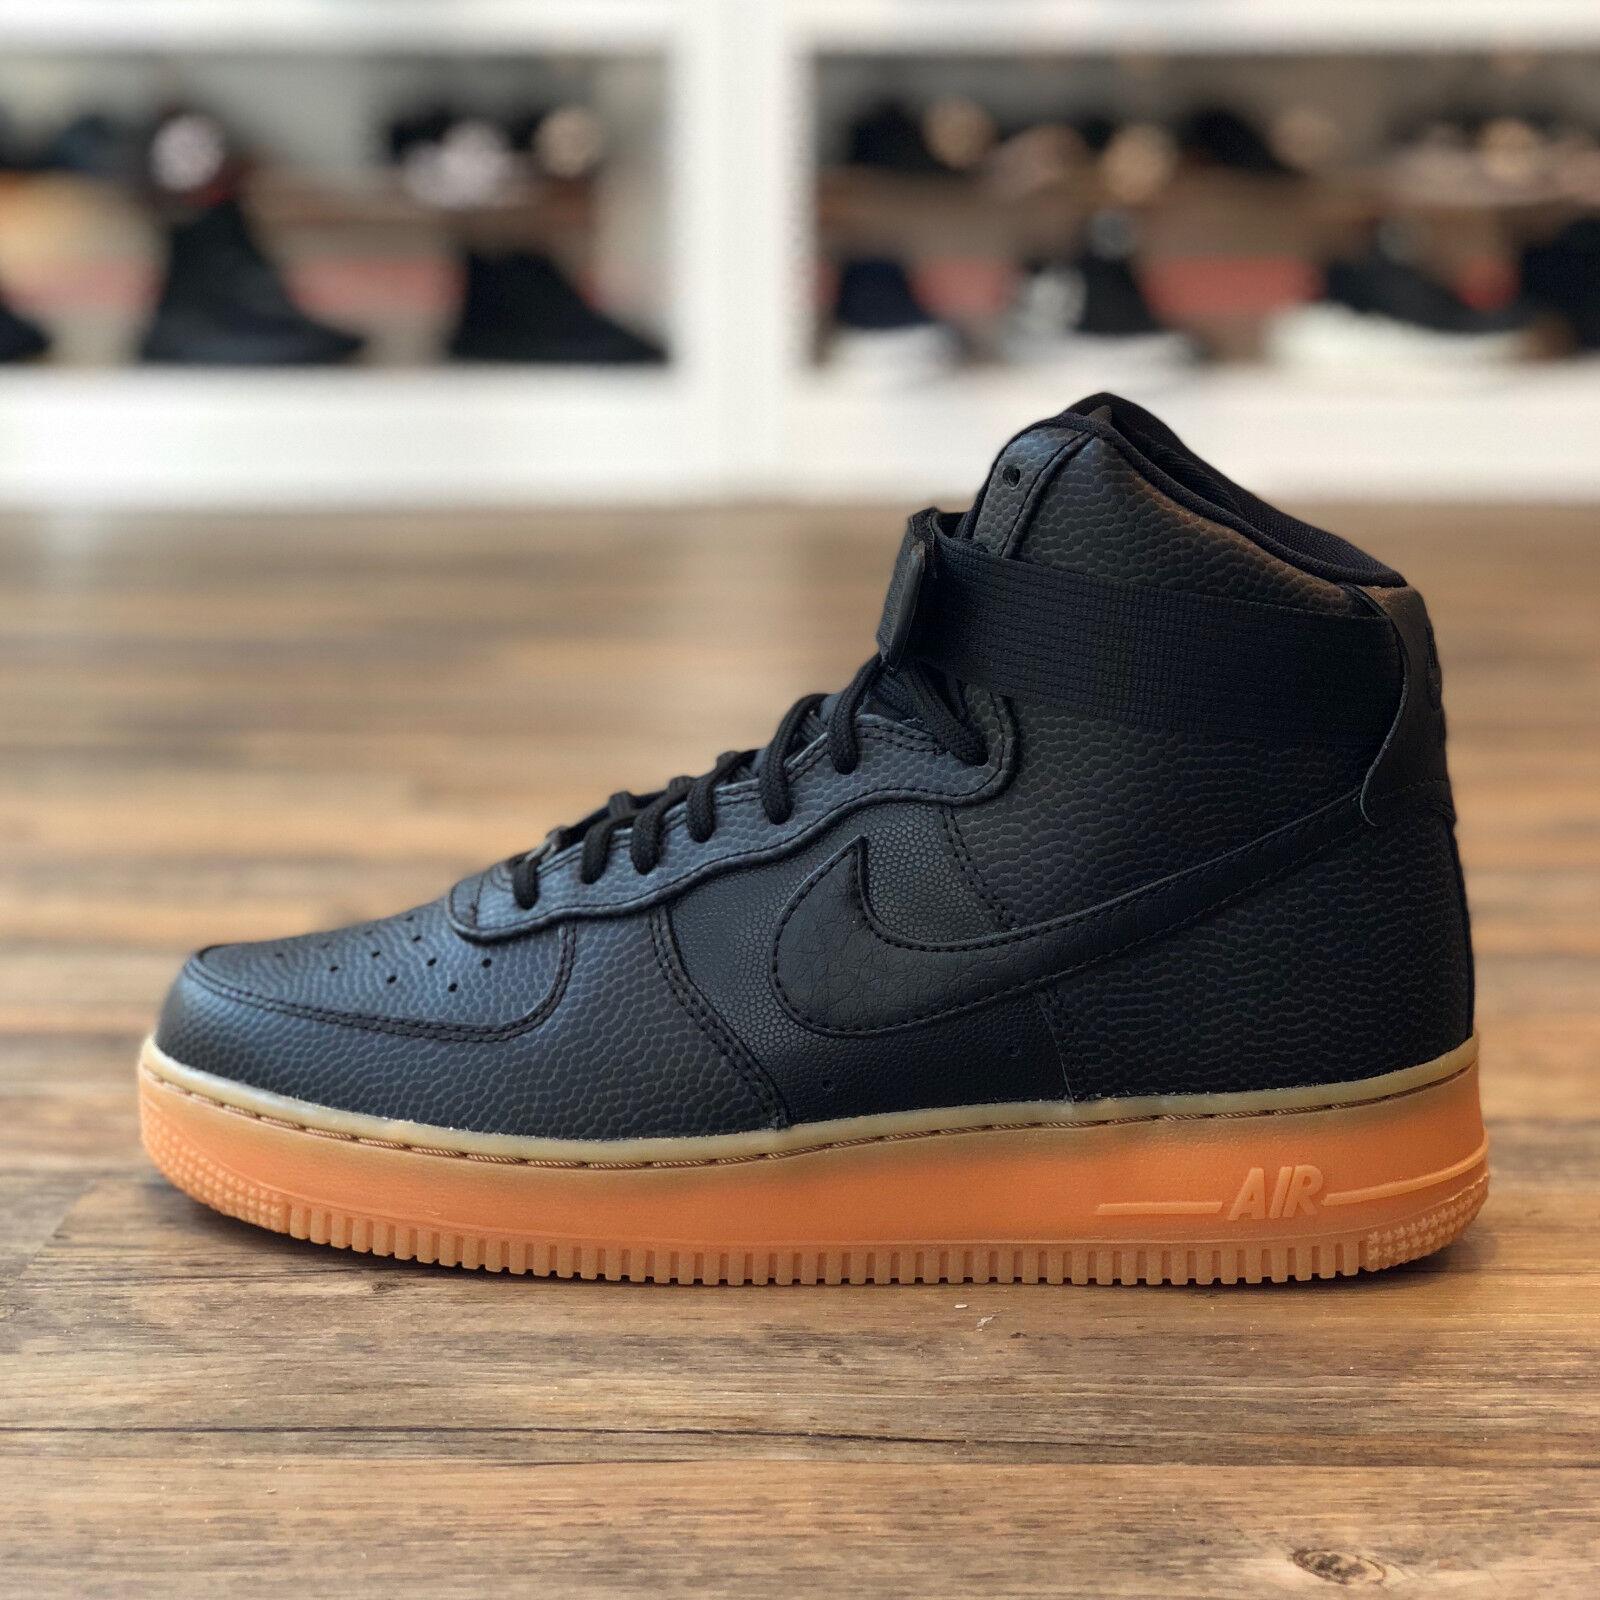 Nike Air Force 1 High se se se talla 38 zapatos top mujer negro de cuero nuevo 860544 002  centro comercial de moda